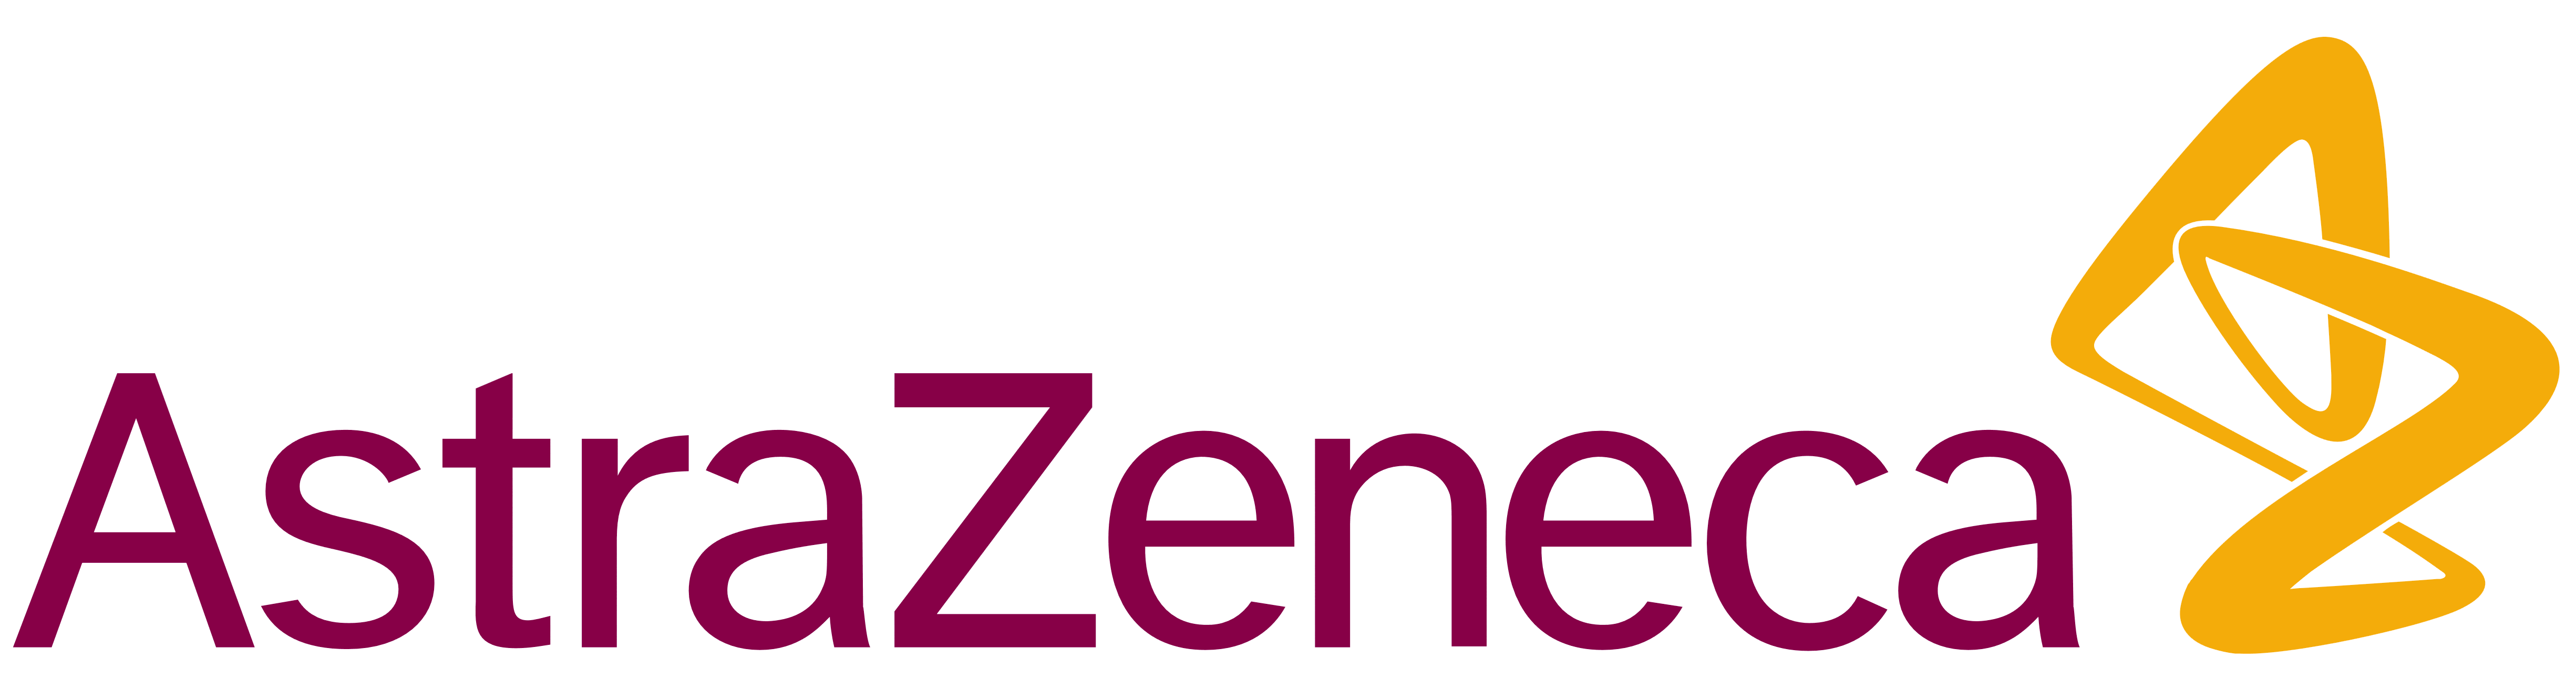 astrazeneca-logo-png-astrazeneca-logo-astra-zeneca-4902